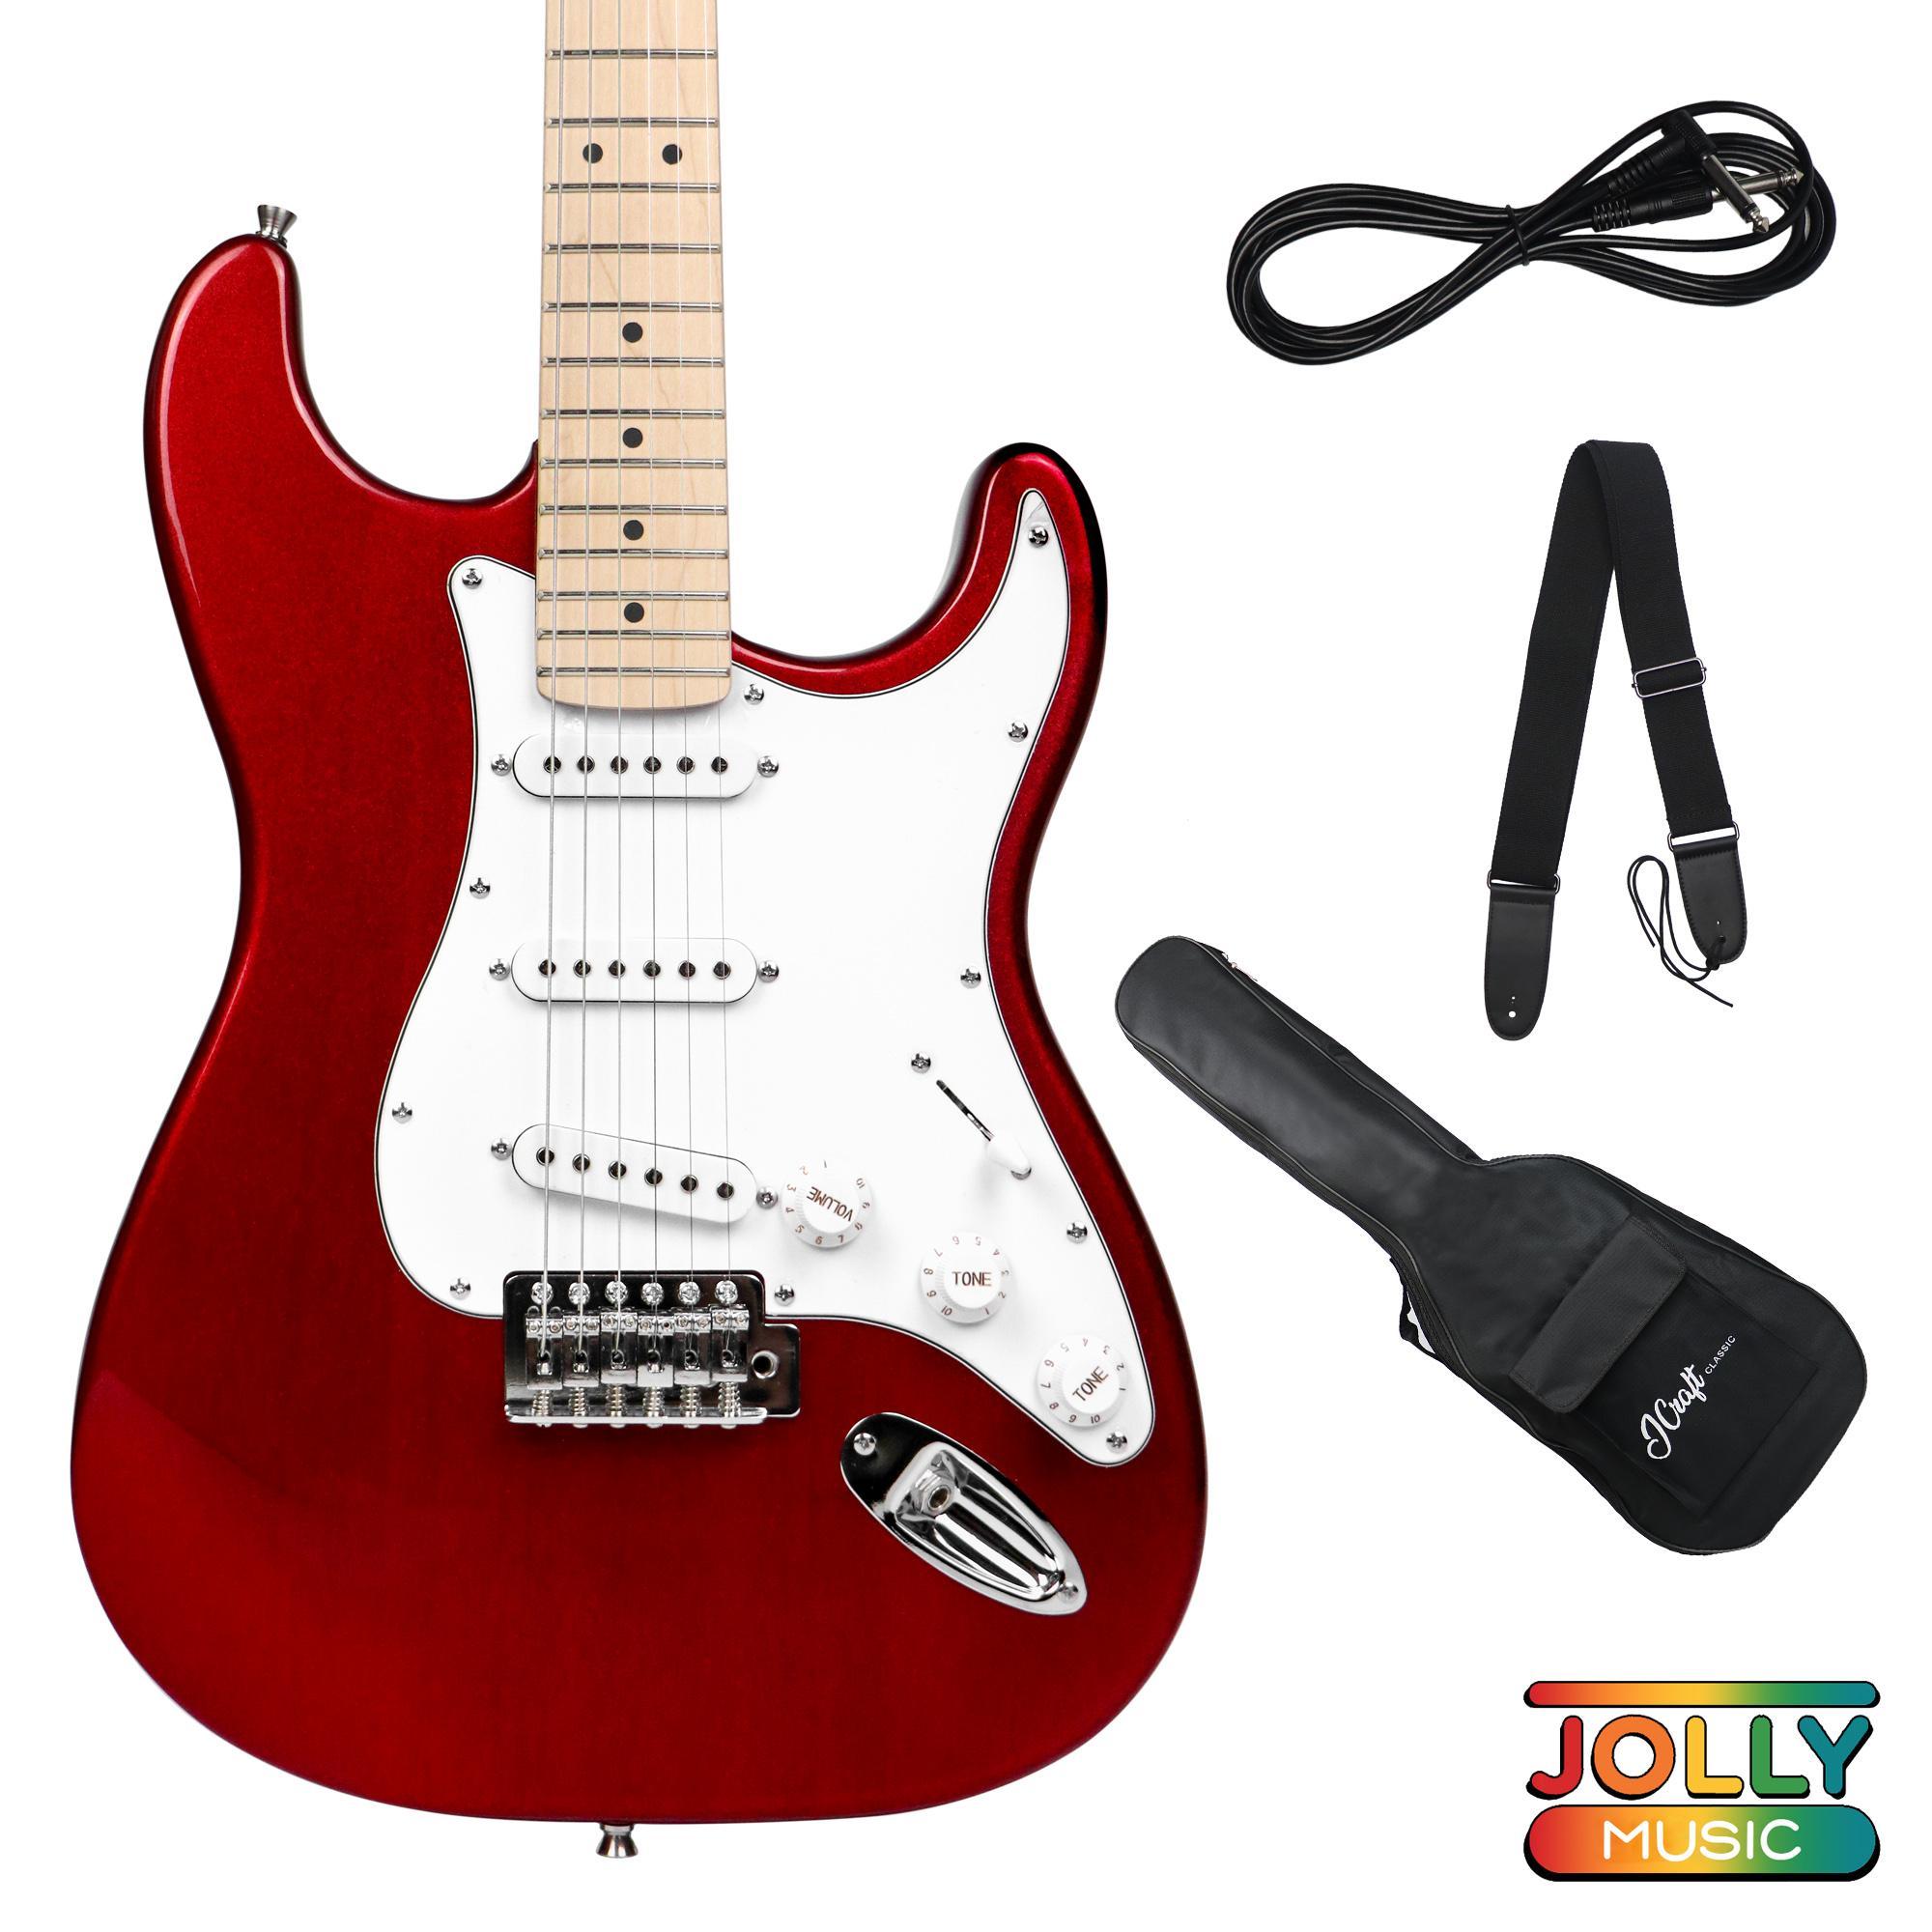 J-Craft S-1 Stratocaster Electric Guitar